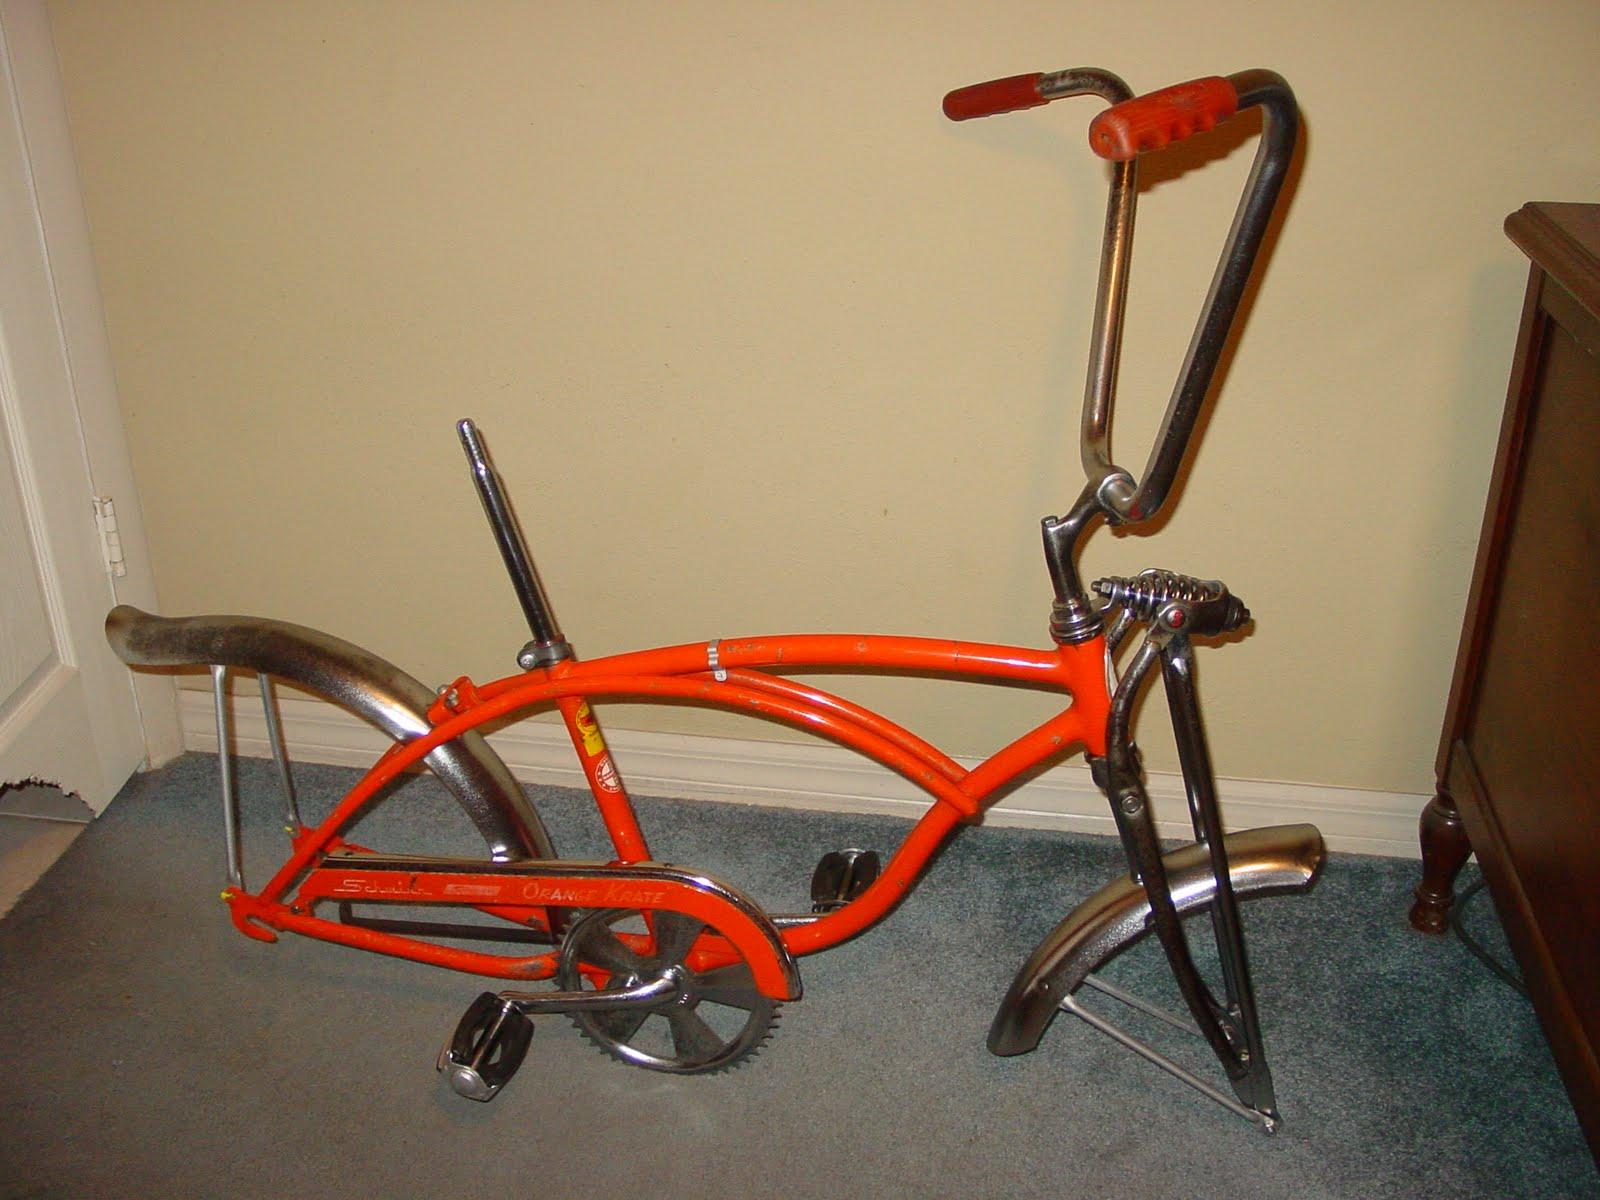 Update The Littlebig Bikes Are Coming Again: VINTAGE HIDE-OUT: December 1968 Schwinn Orange Krate